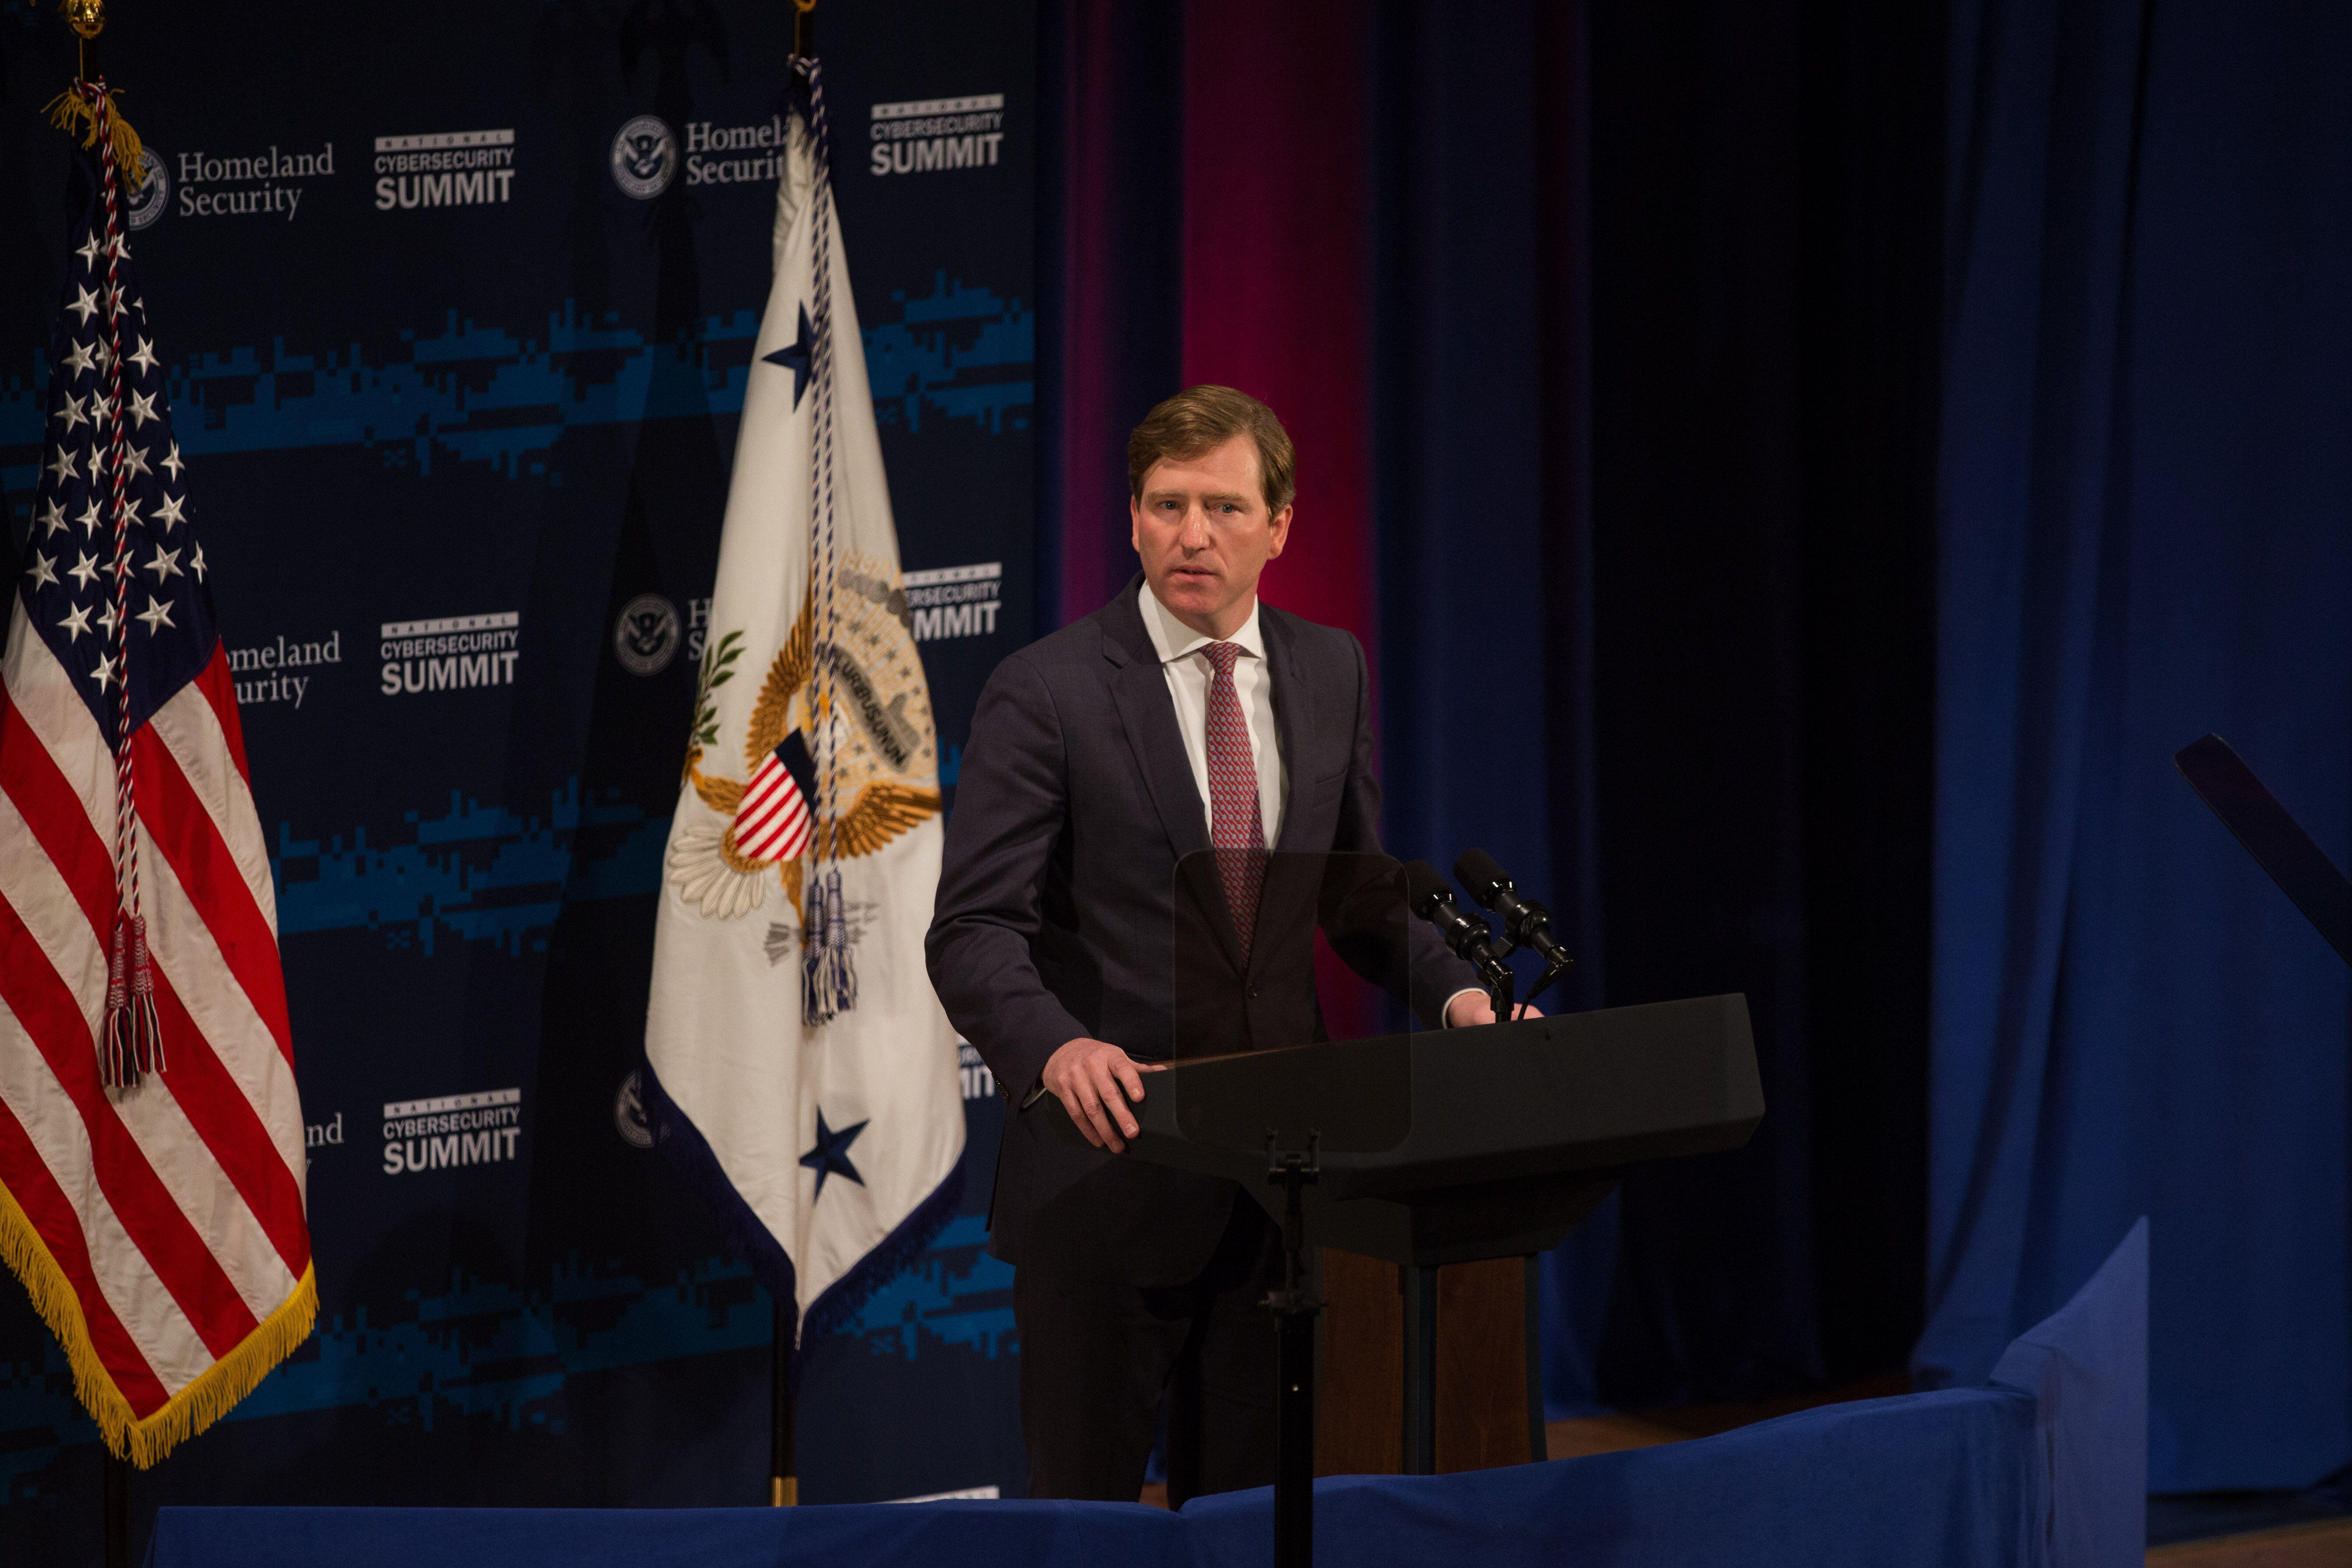 NEW YORK, NY - JULY 31: U.S. Department of Homeland Security Under Secretary Chris Krebs speaks during the Department of Home